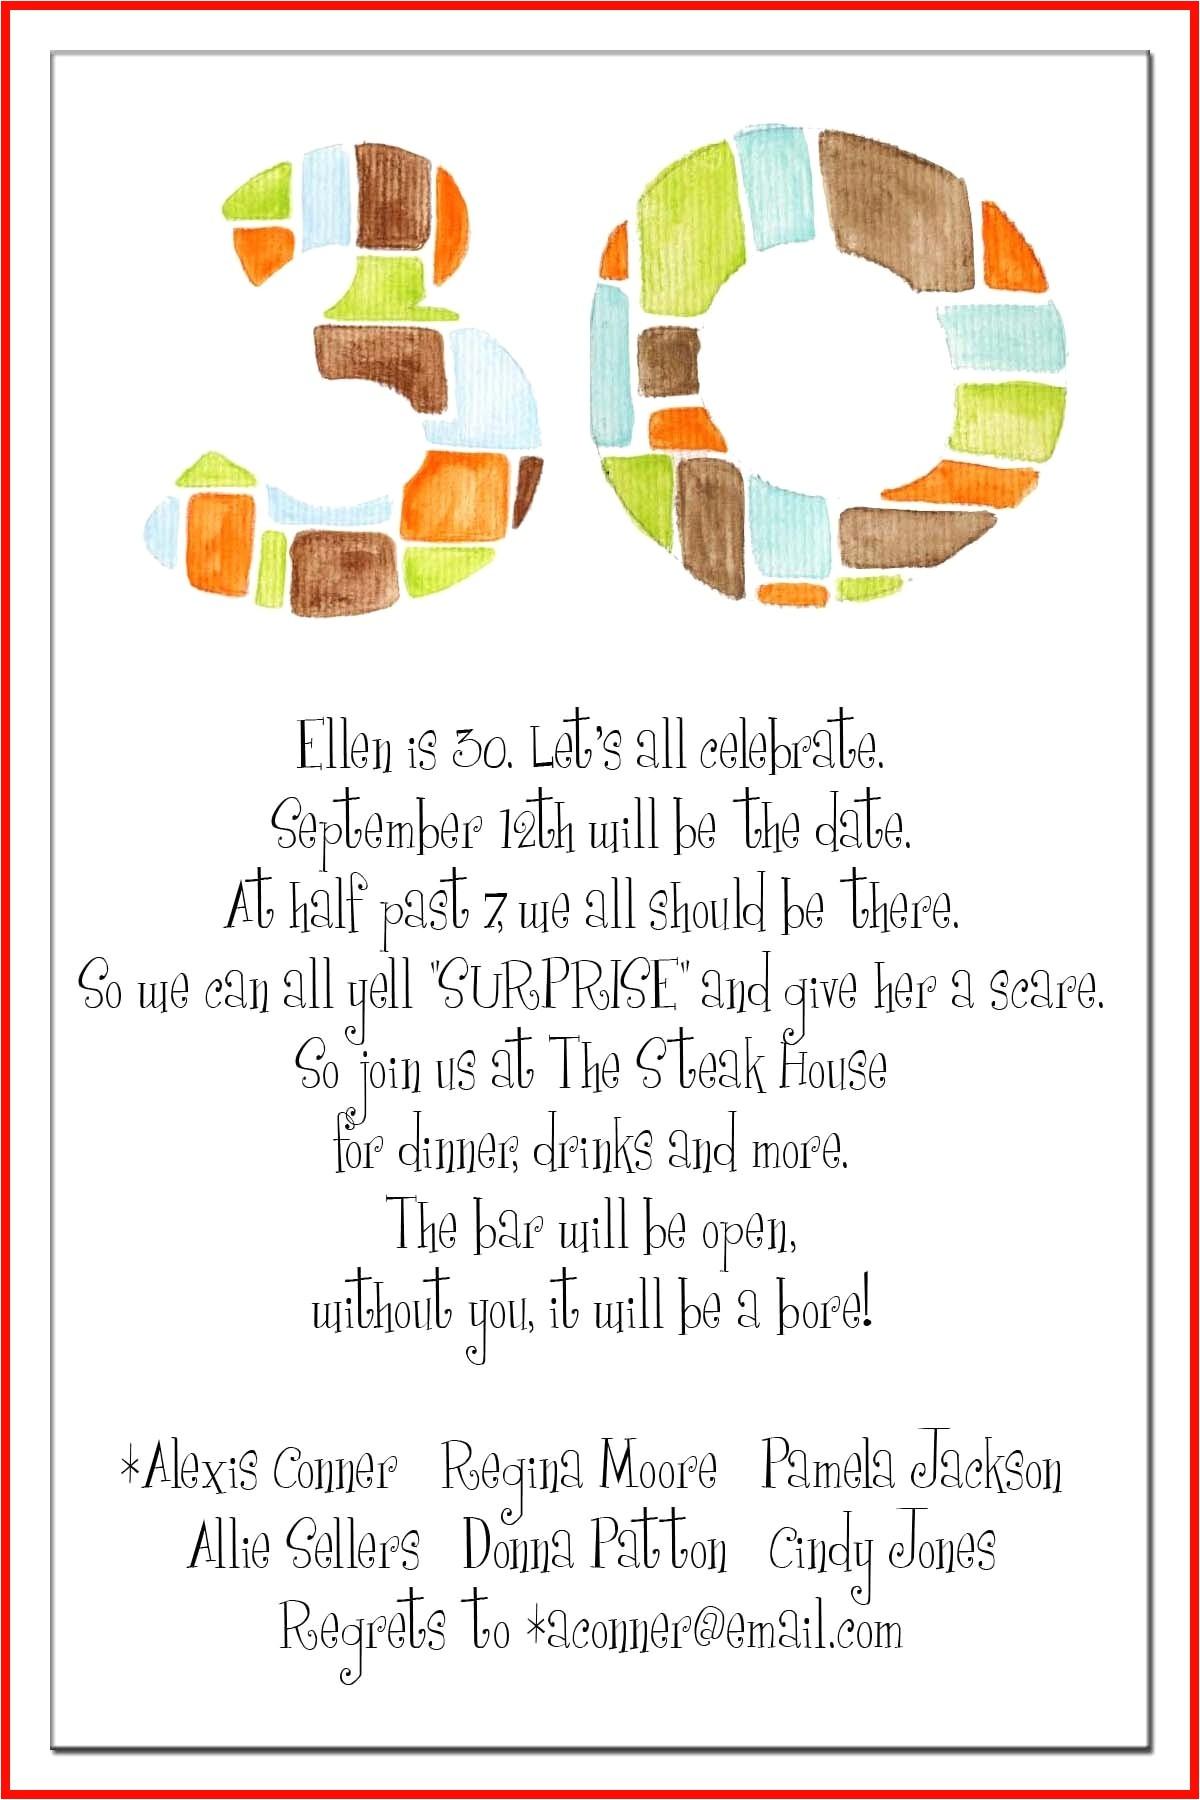 40th birthday party invitation wording funny